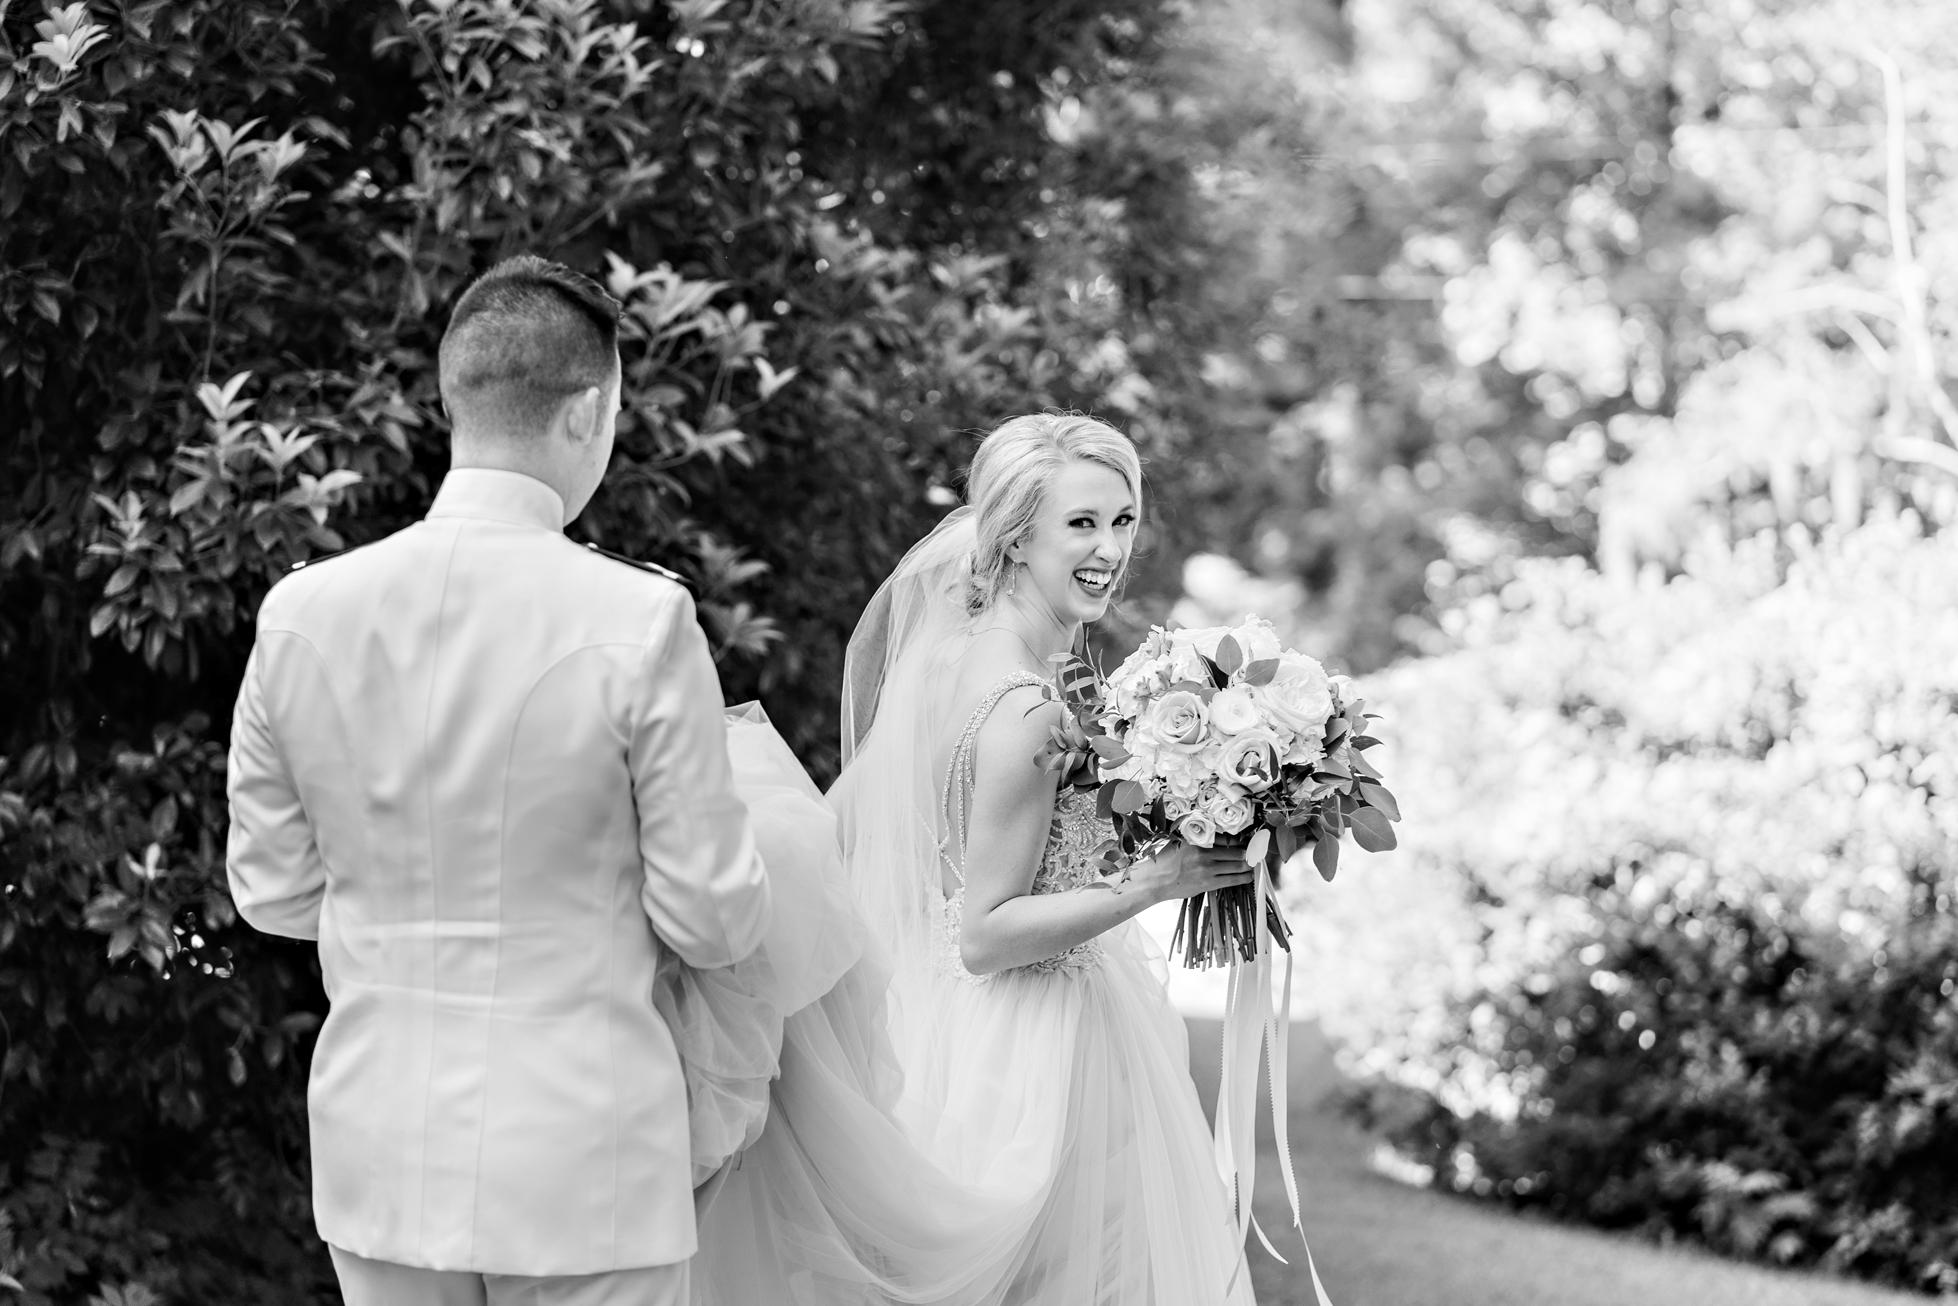 Alabama-Photographers-Nick-Drollette-Wedding-Photography-132.jpg